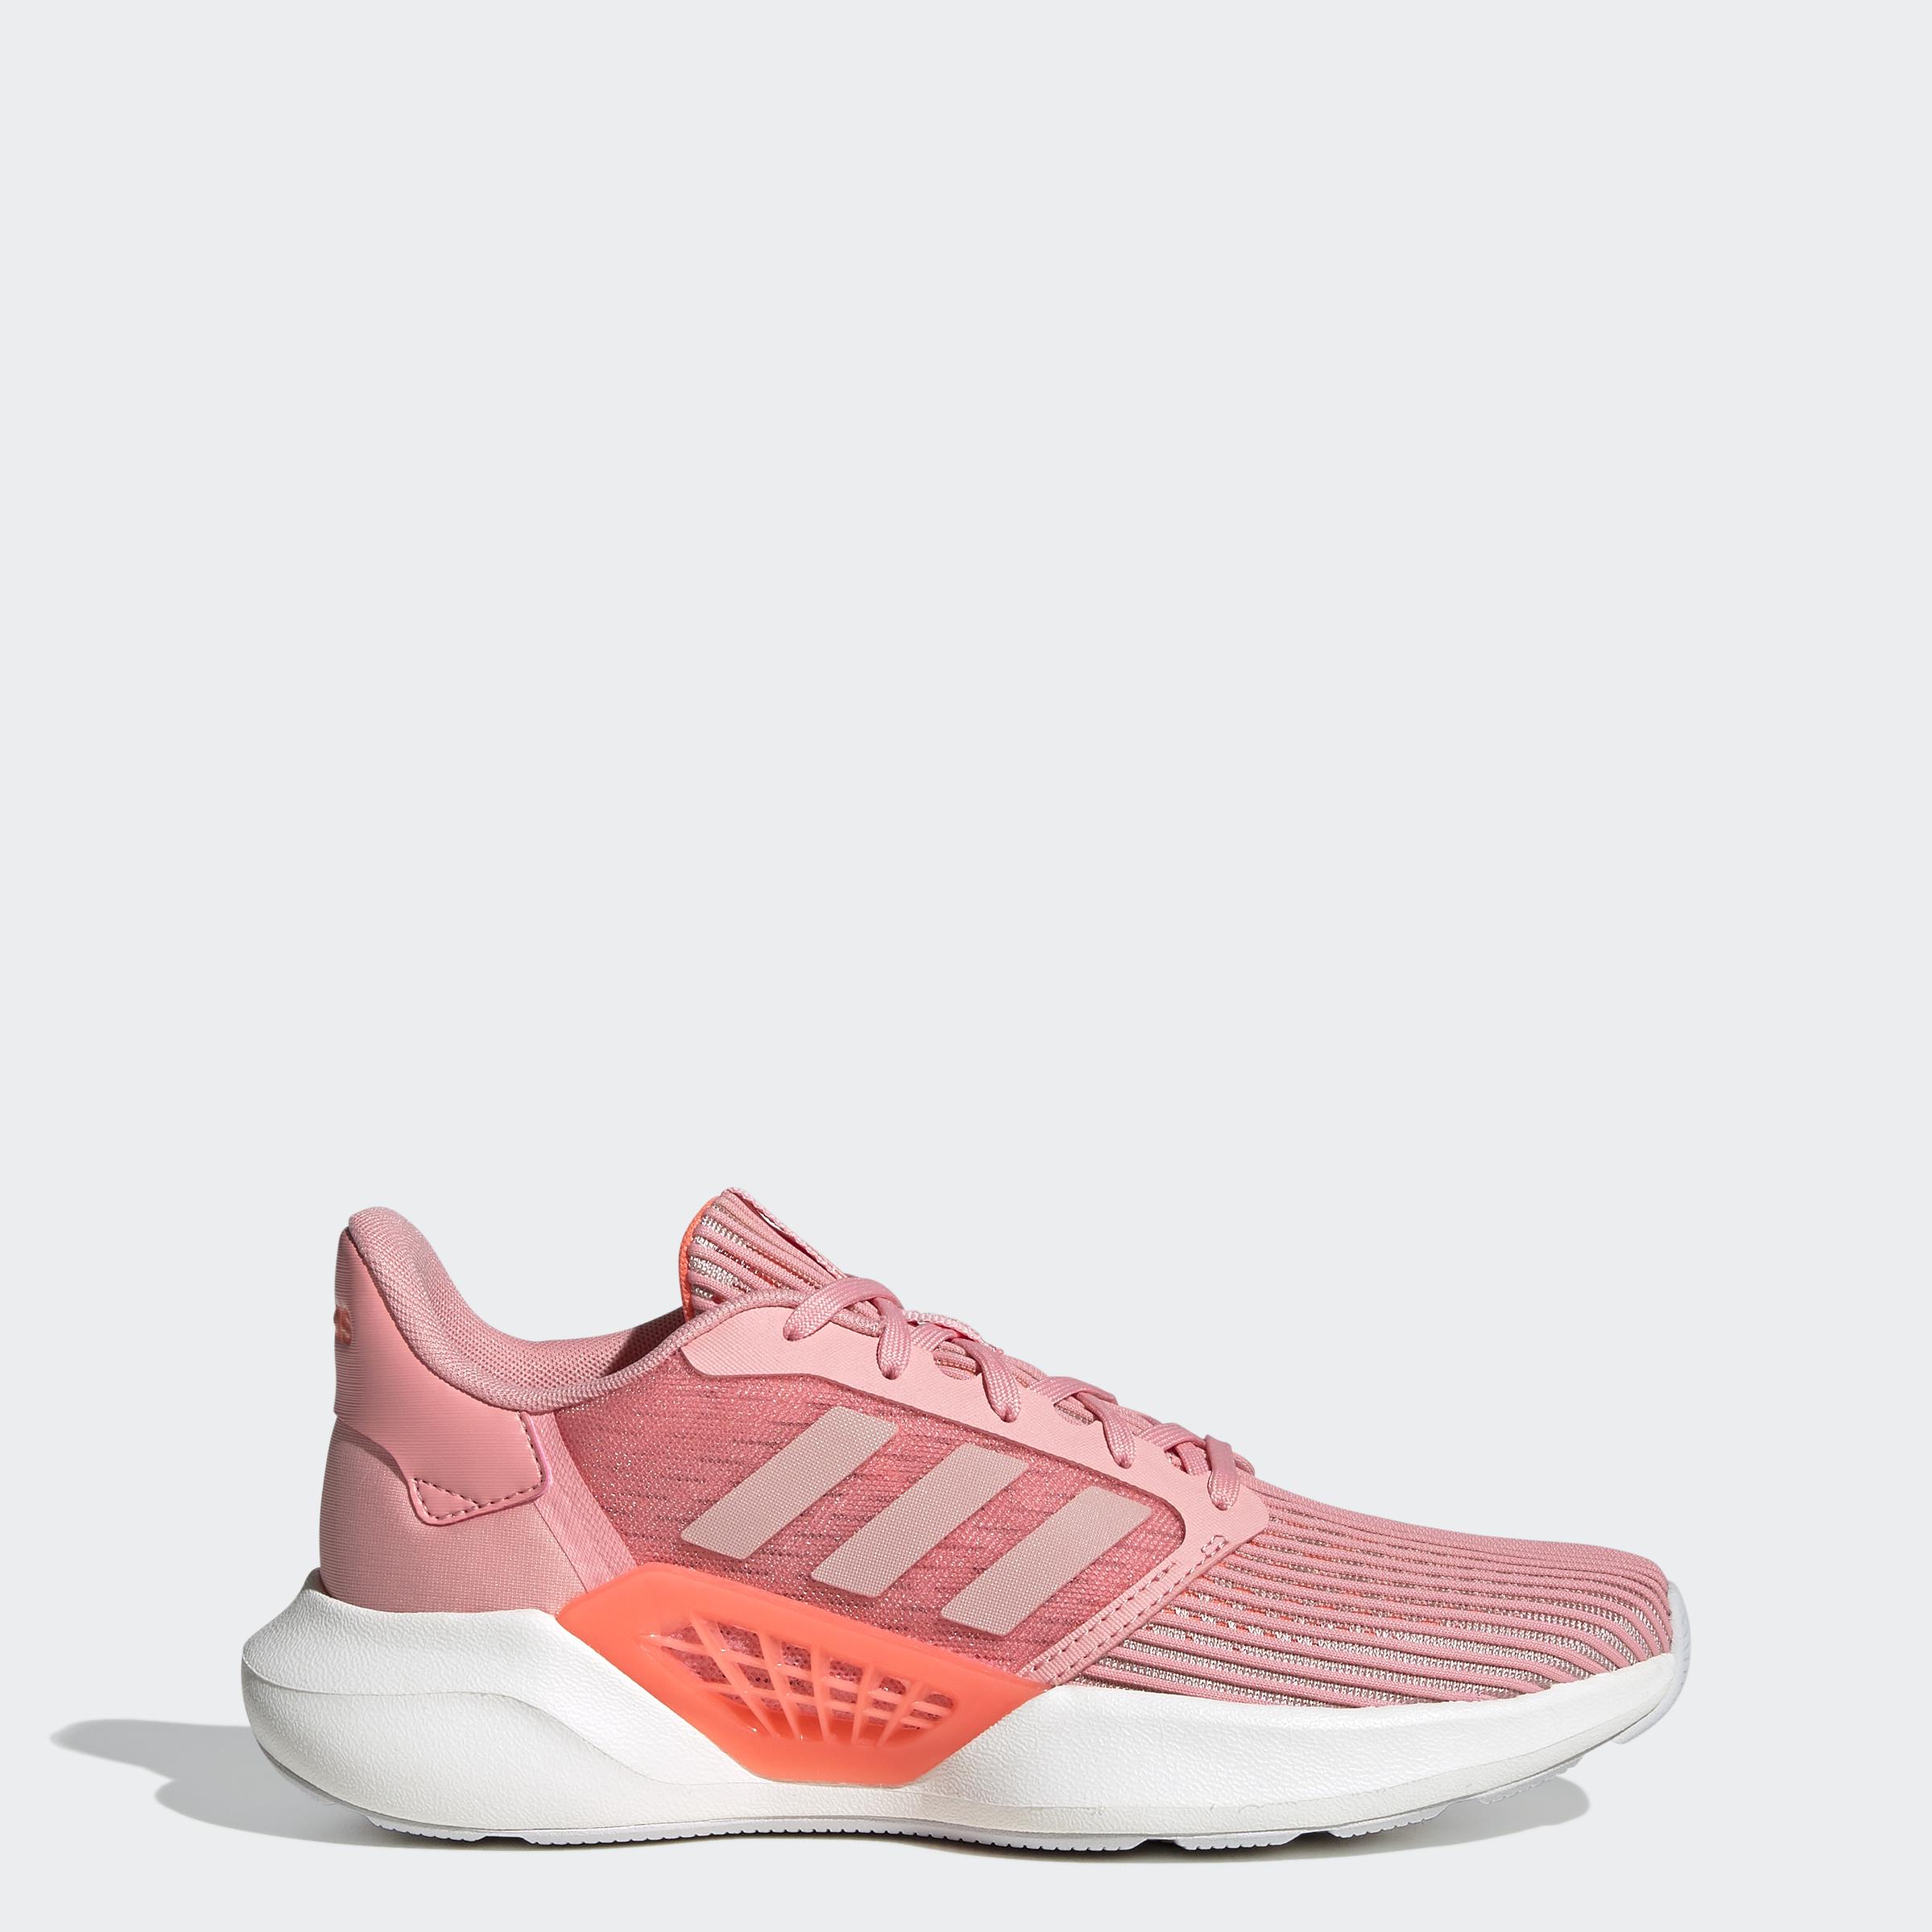 adidas Ventice Shoes Women's